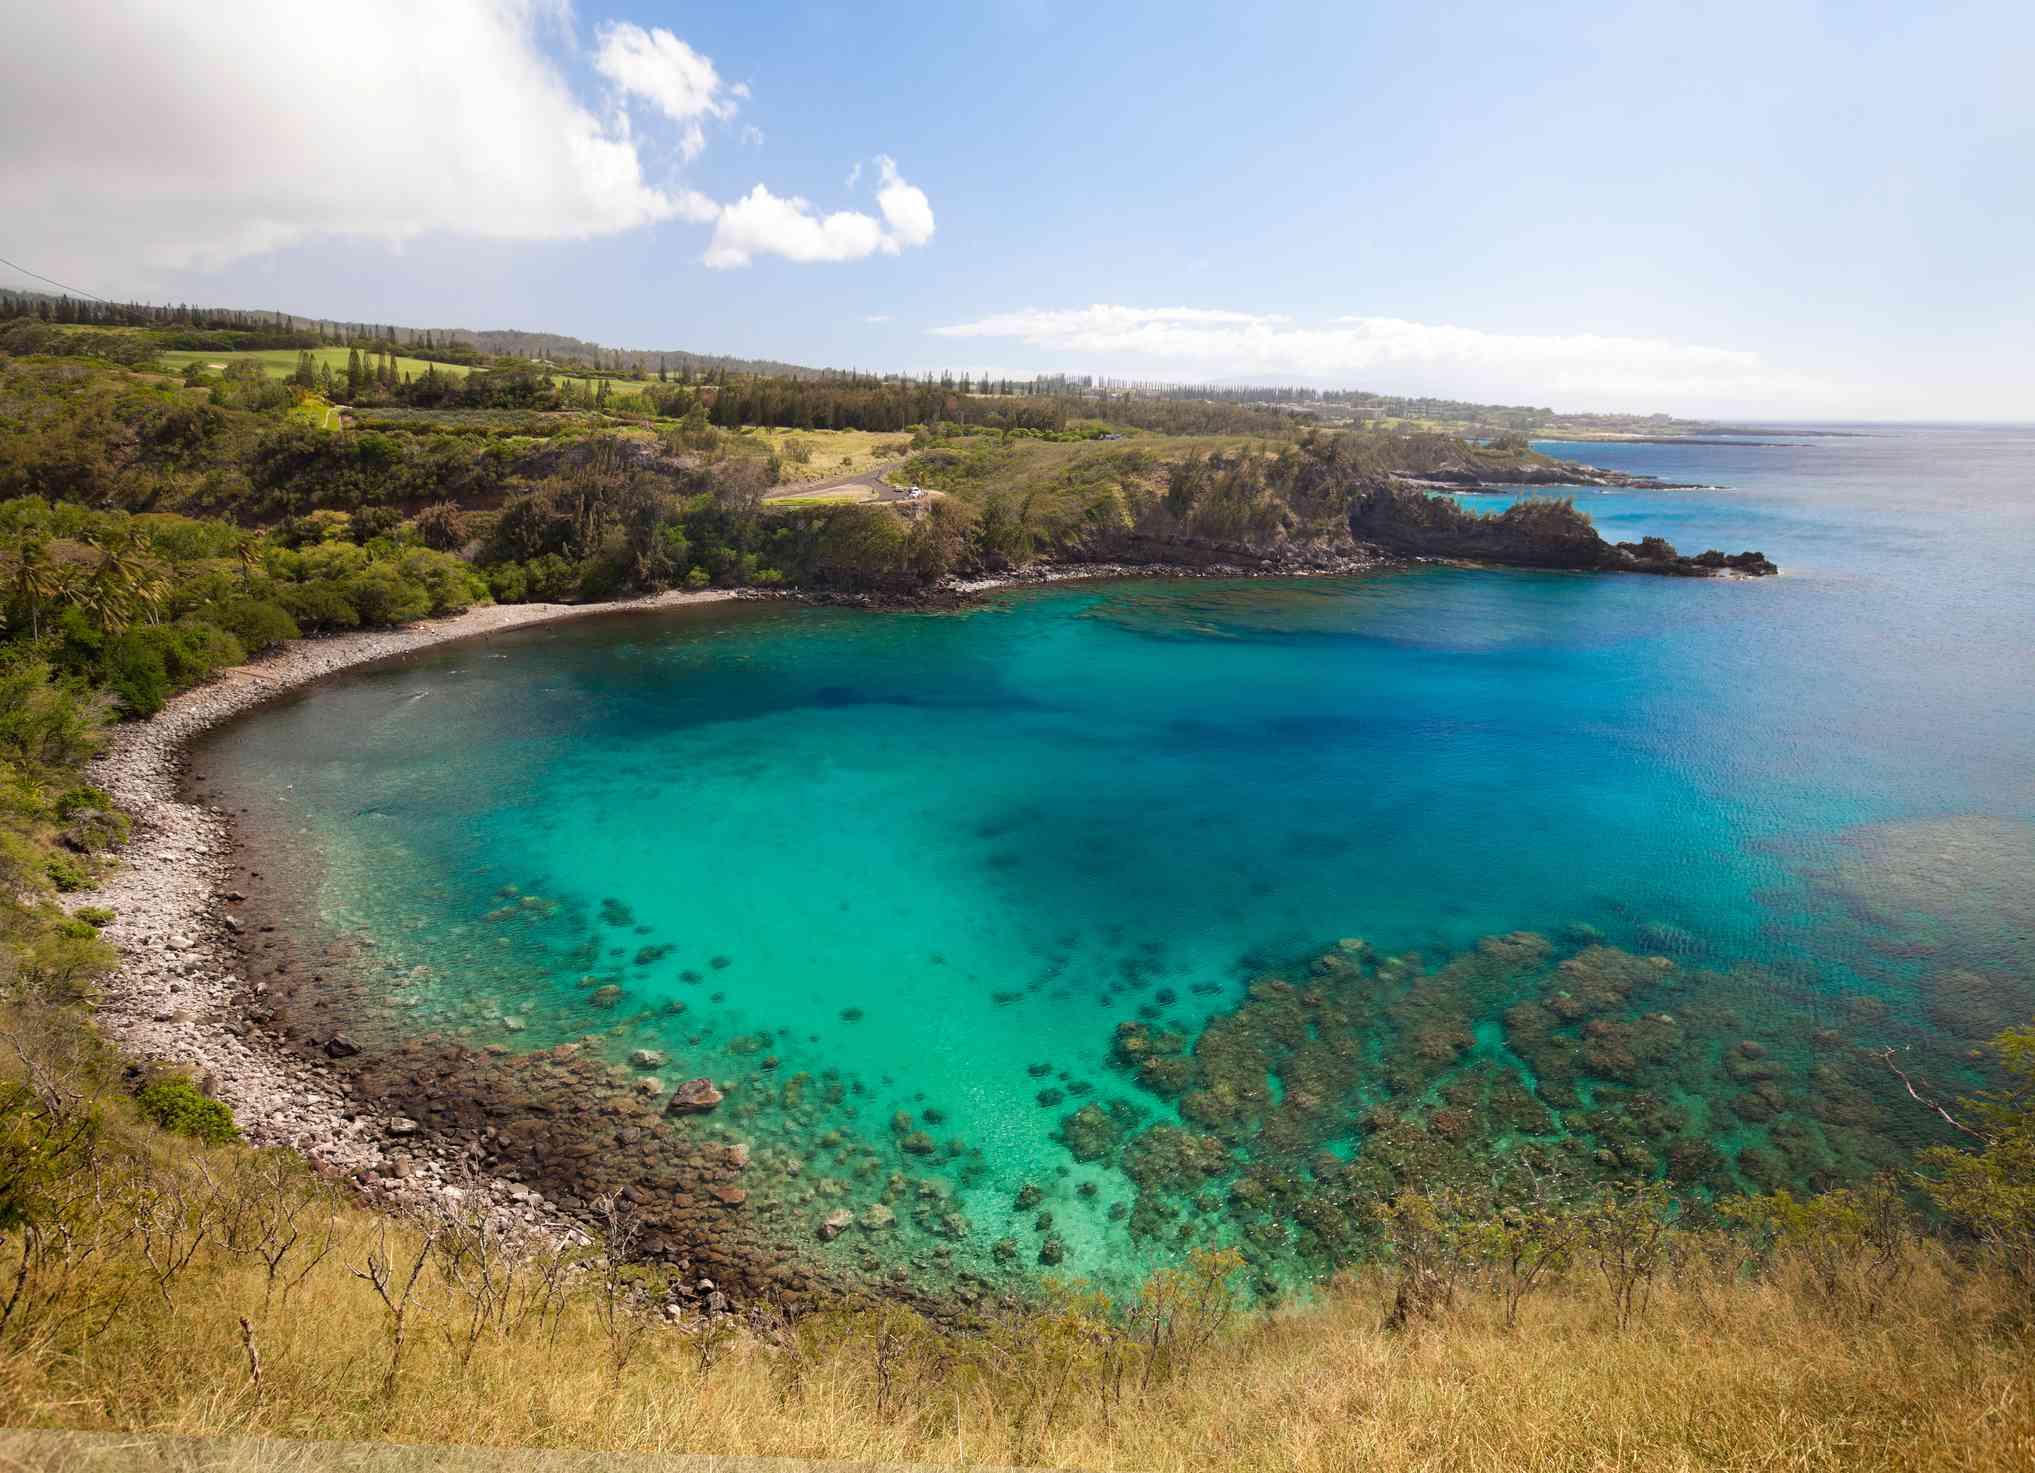 Honolua Bay in Maui, Hawaii